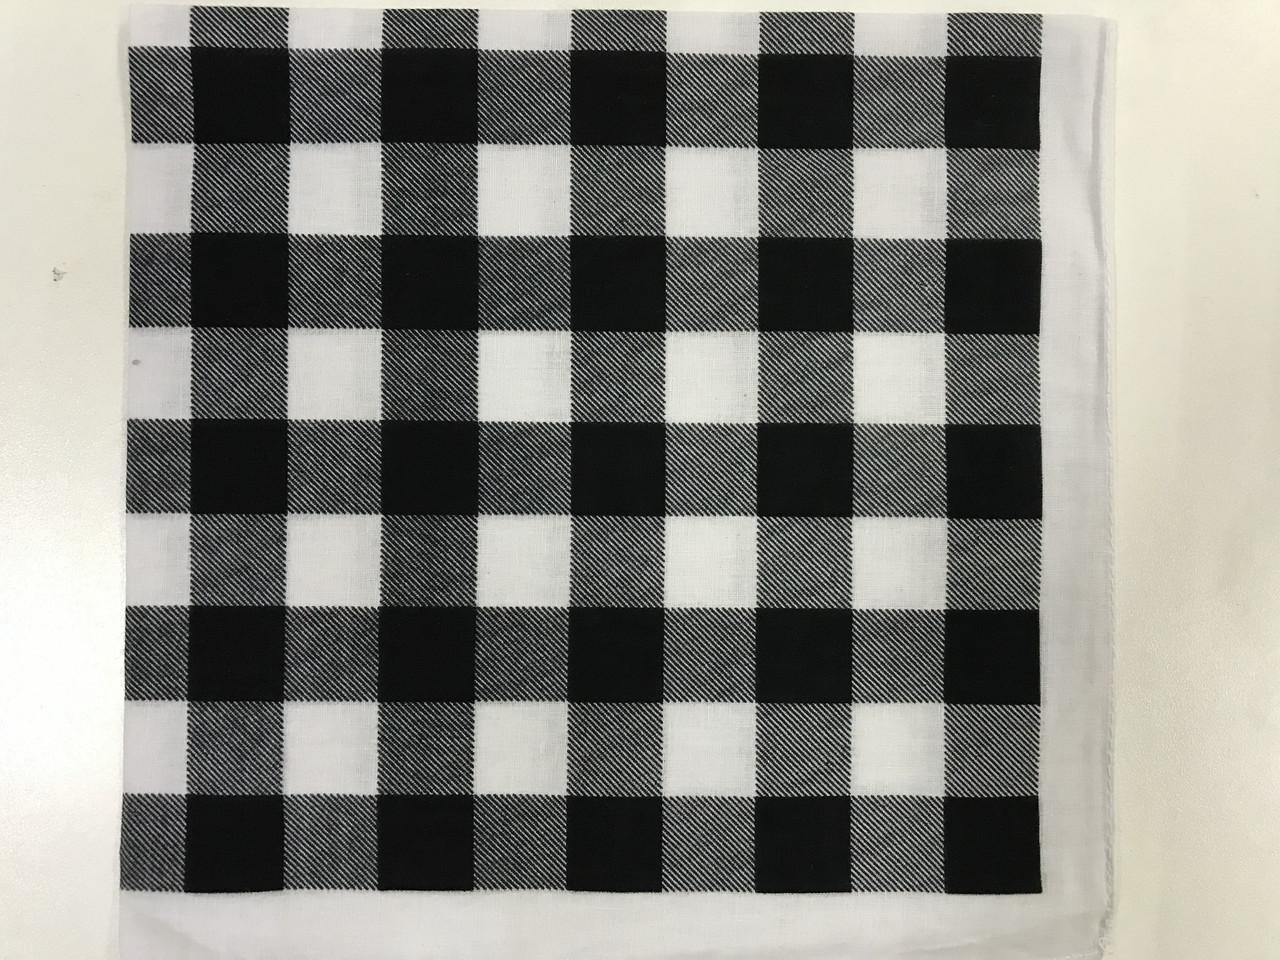 Хлопковая бандана (косынка) чёрно-белая